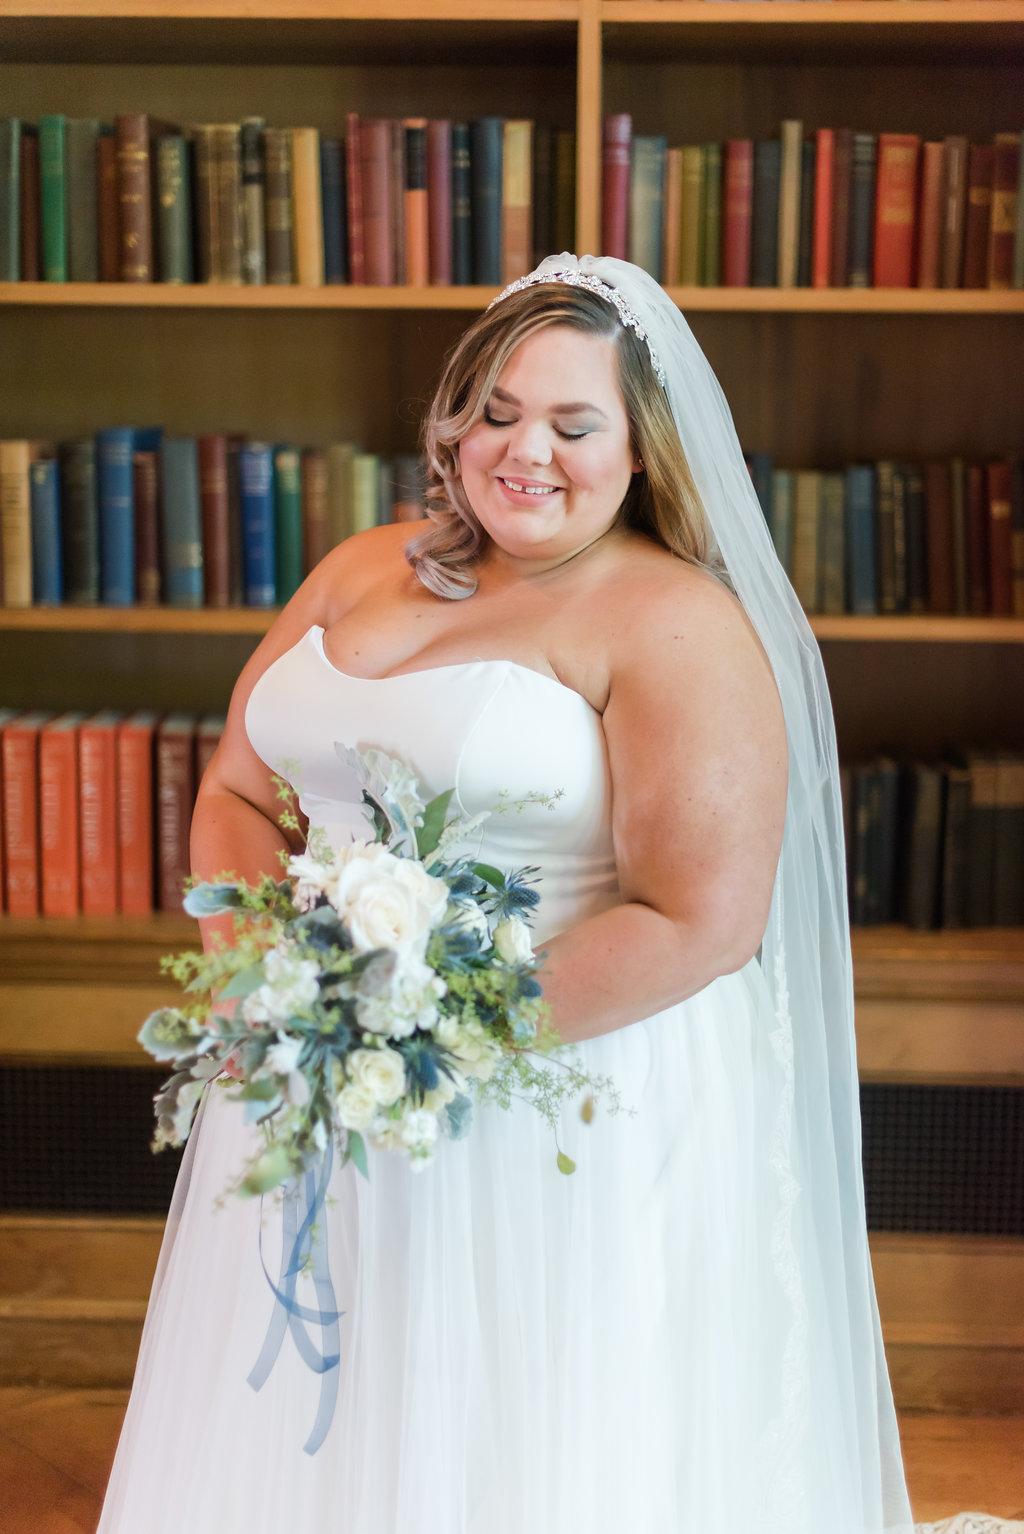 Tulle Ball Wedding Gown Chicago Wedding Rakoteet Photography